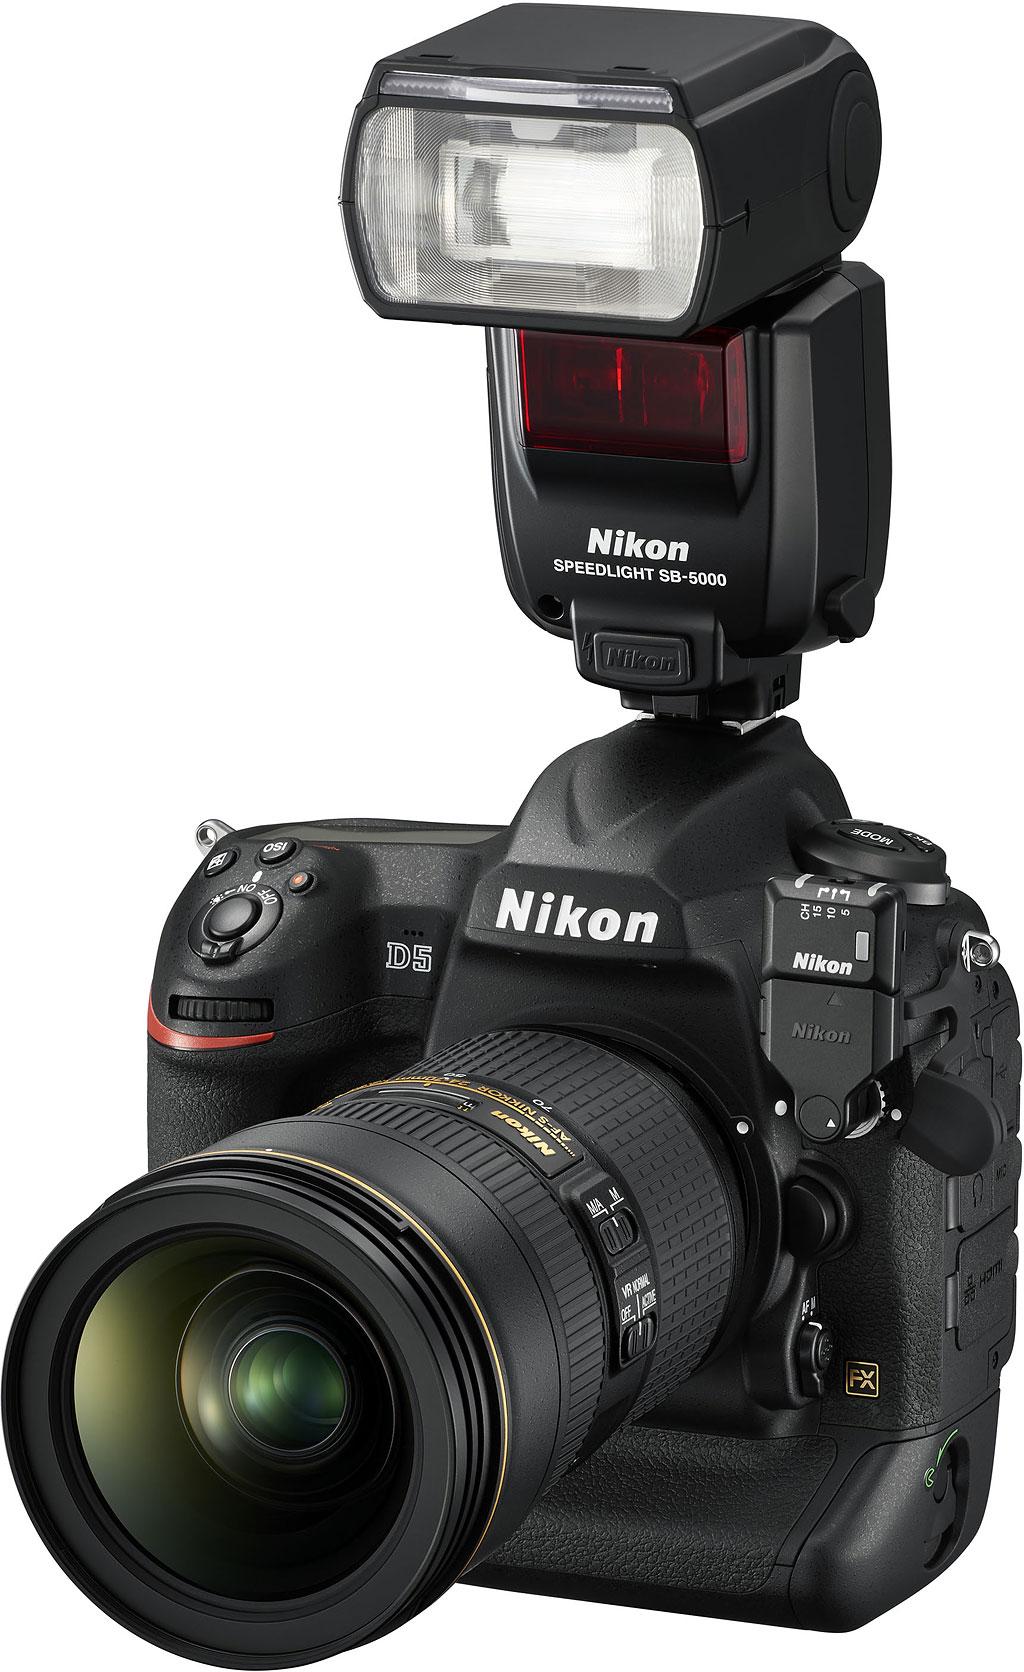 Nikon-D5-Review-1 Nikon D5 Review News and Reviews